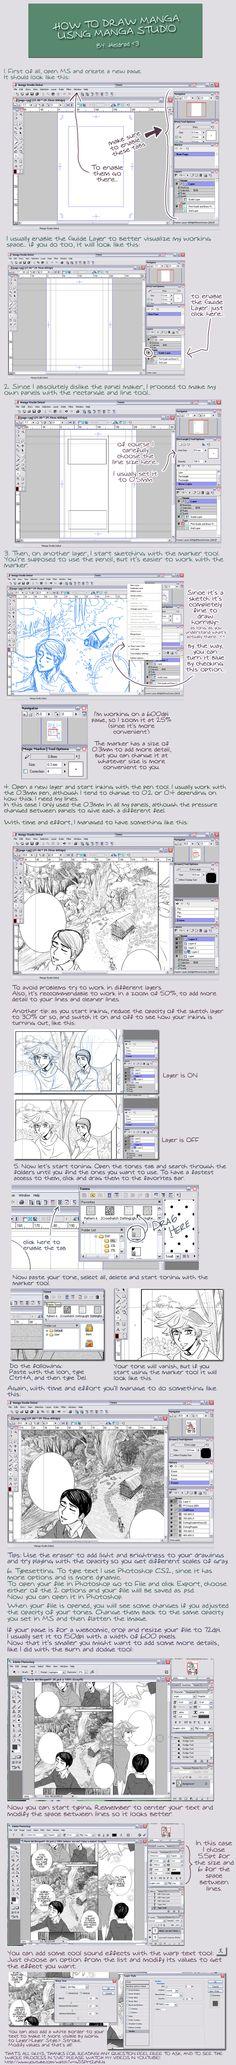 manga studio tutorial by *Heldrad on deviantART